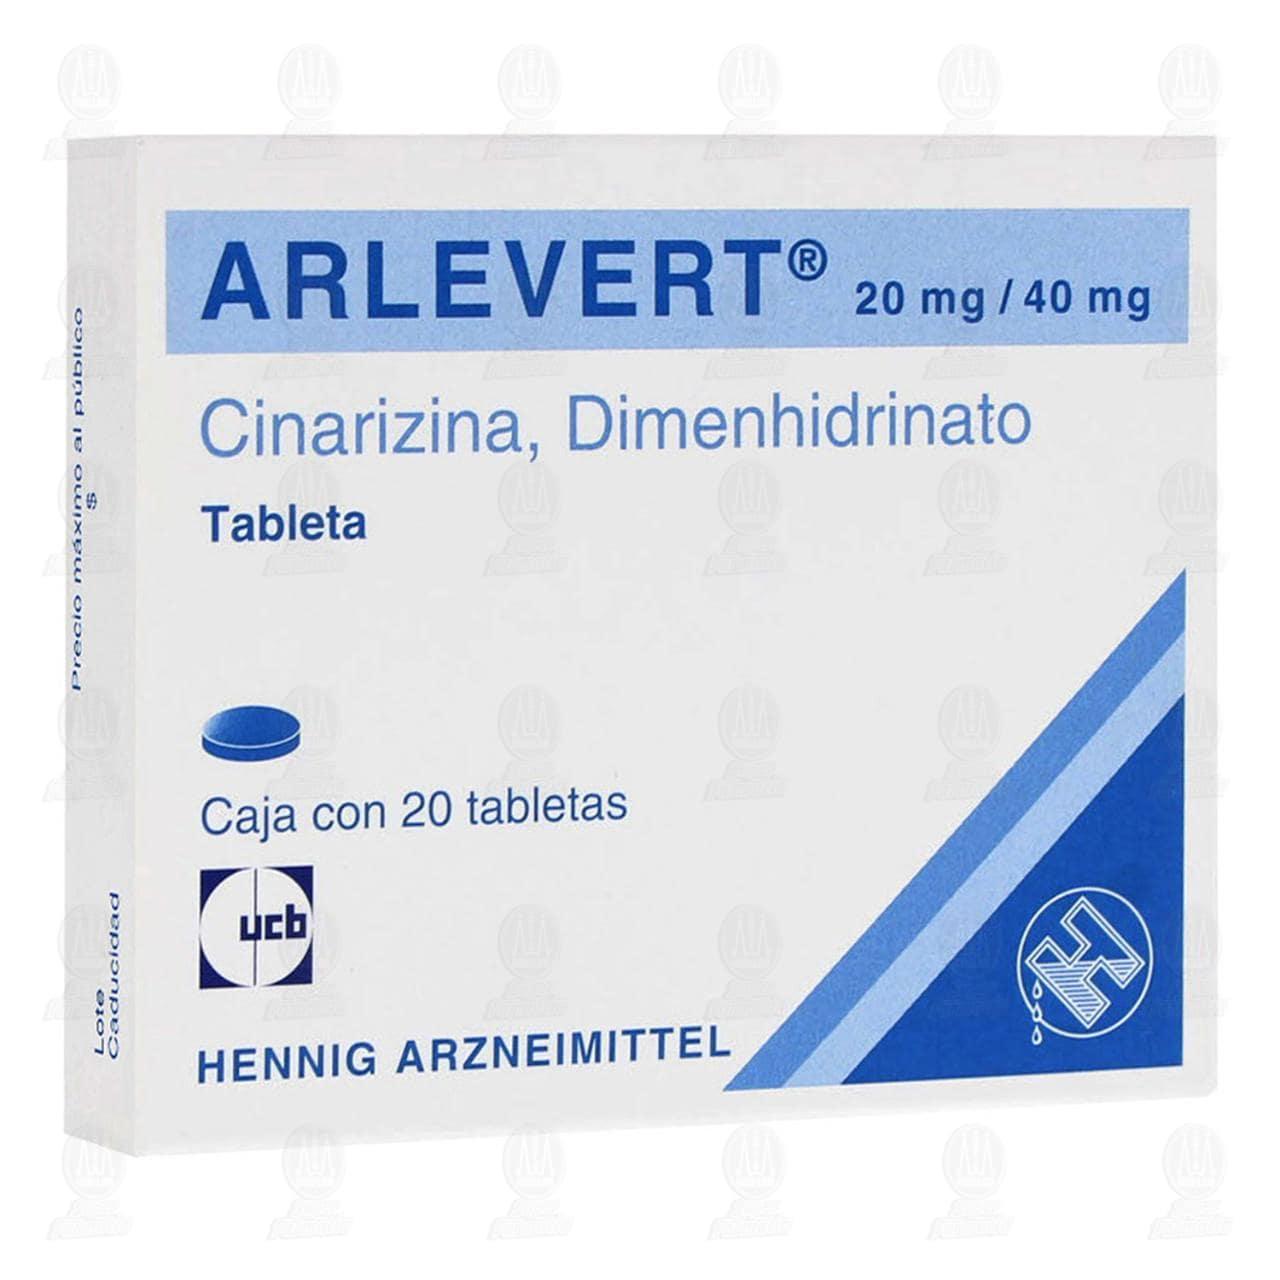 Arlevert 20mg/40mg 20 Tabletas